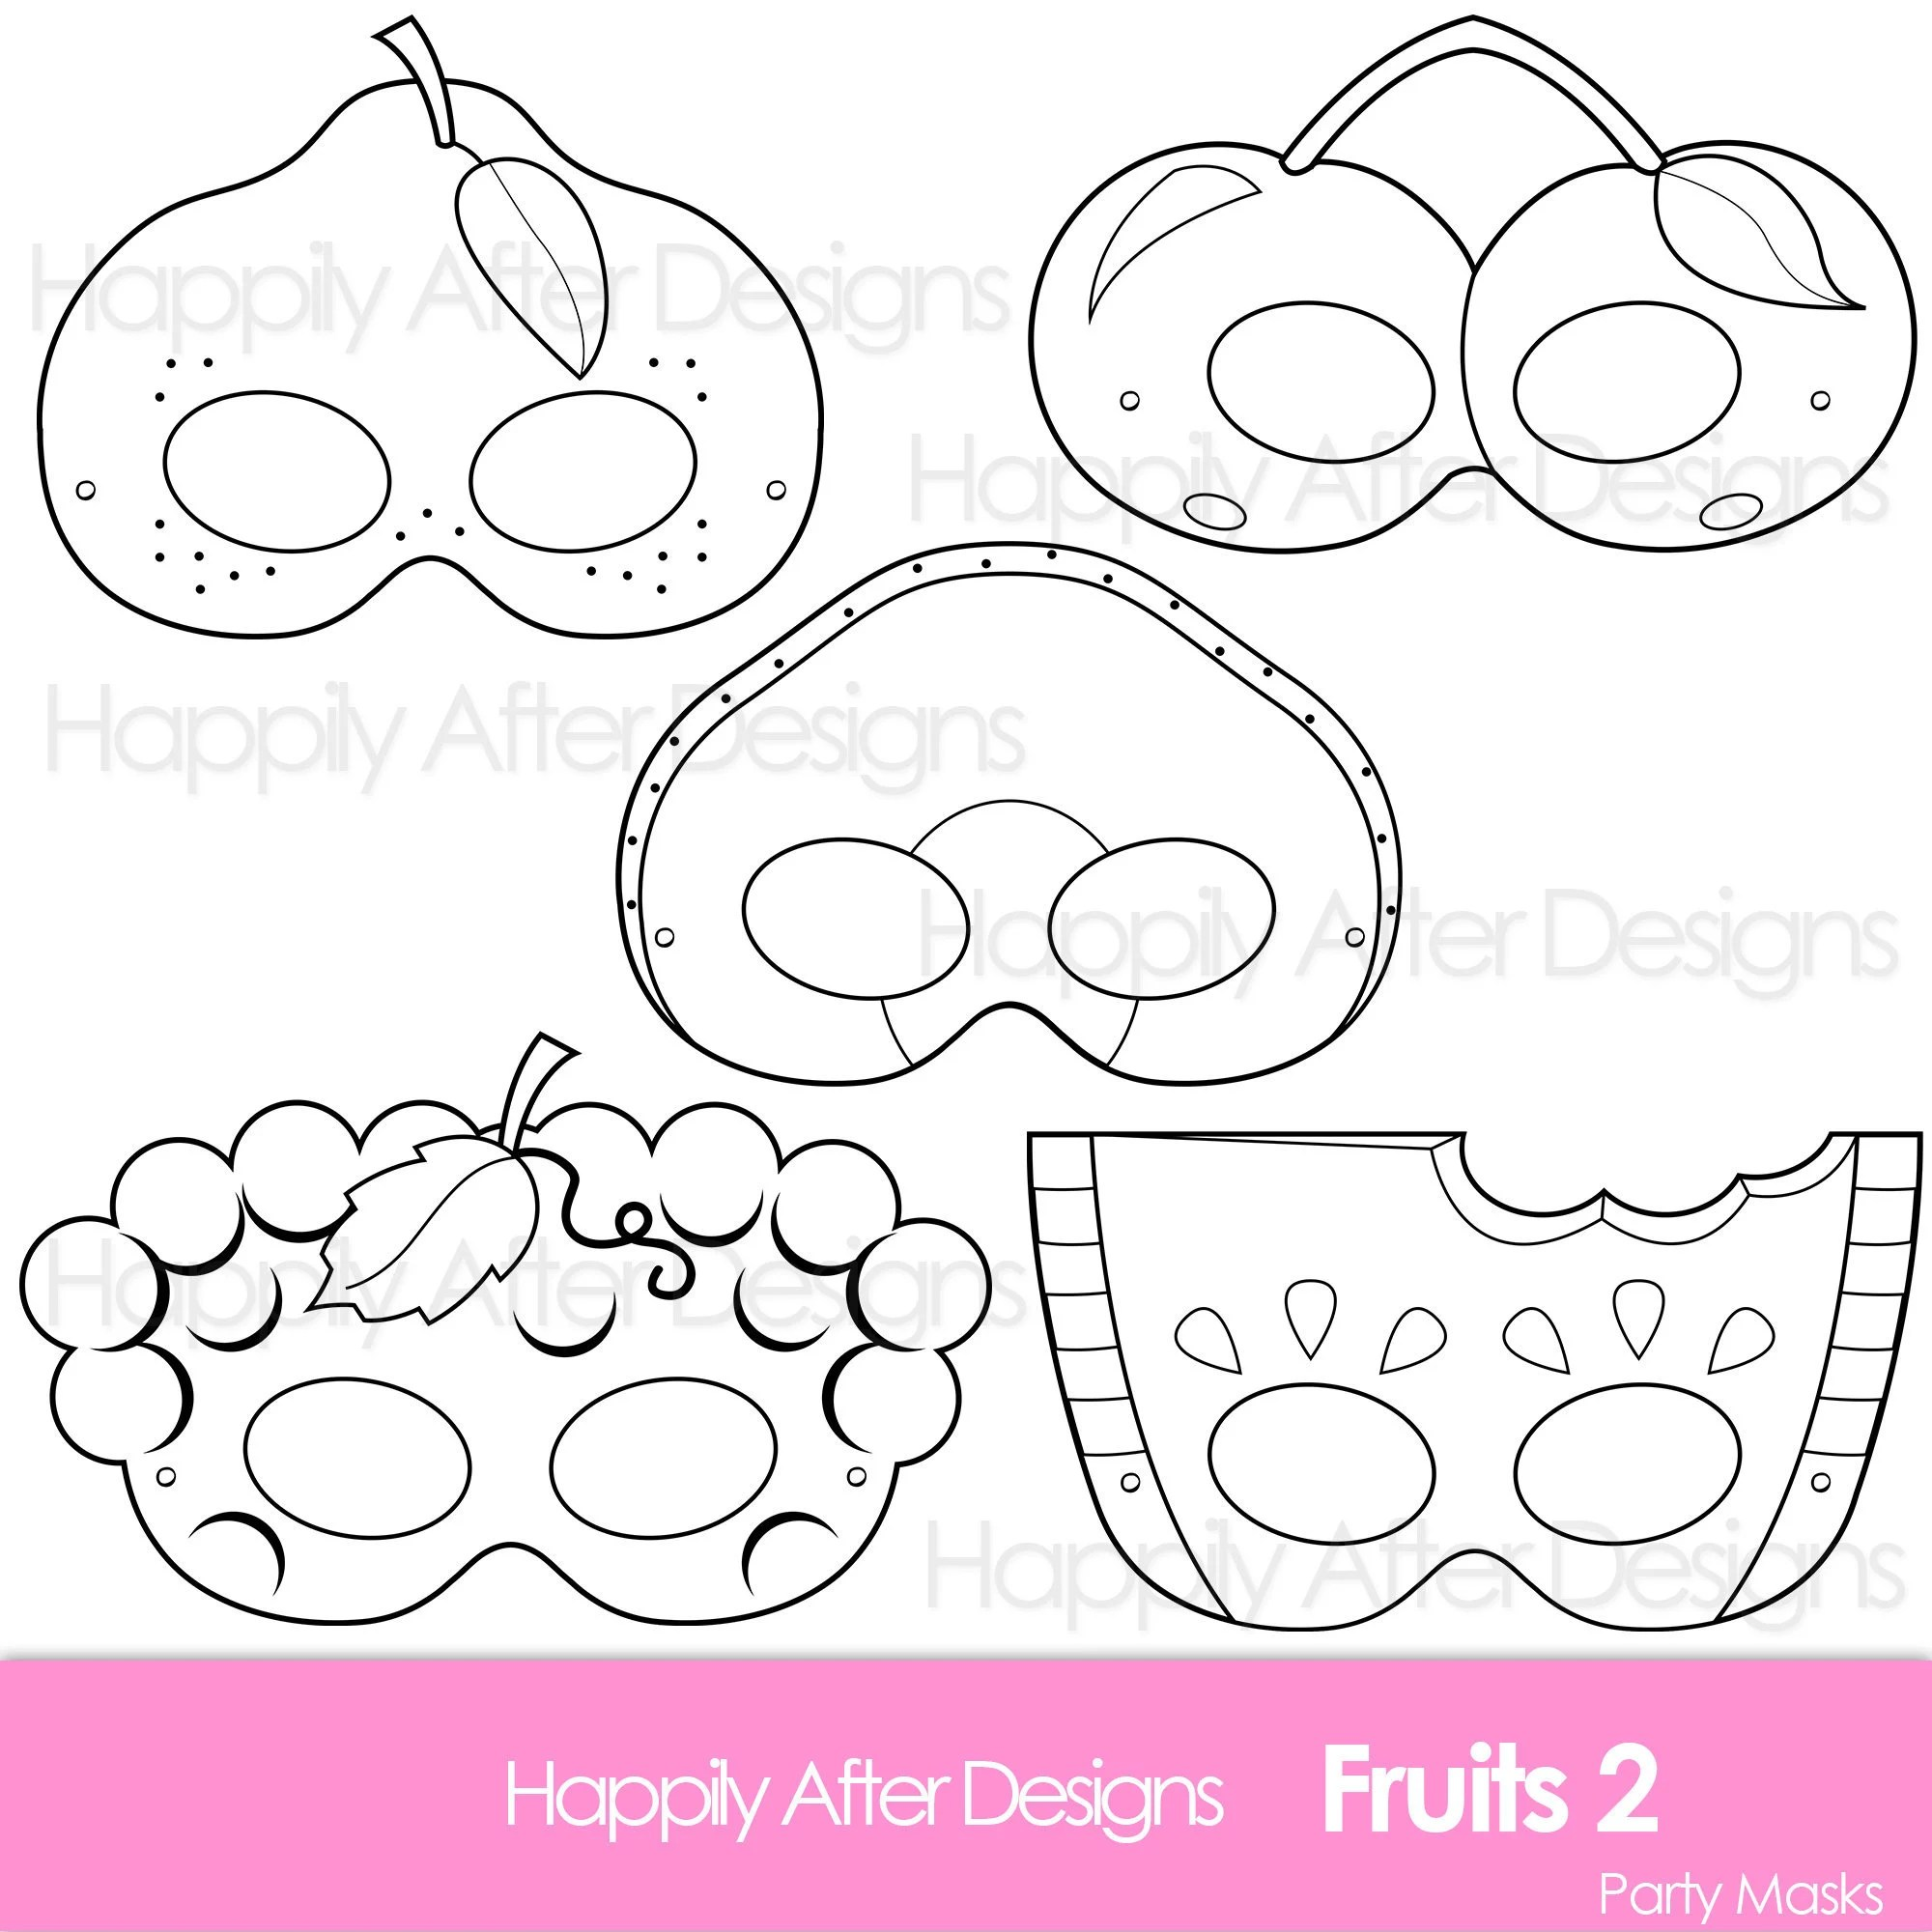 Fruits 2 Printable Coloring Masks Avocado Mask Cherry Mask